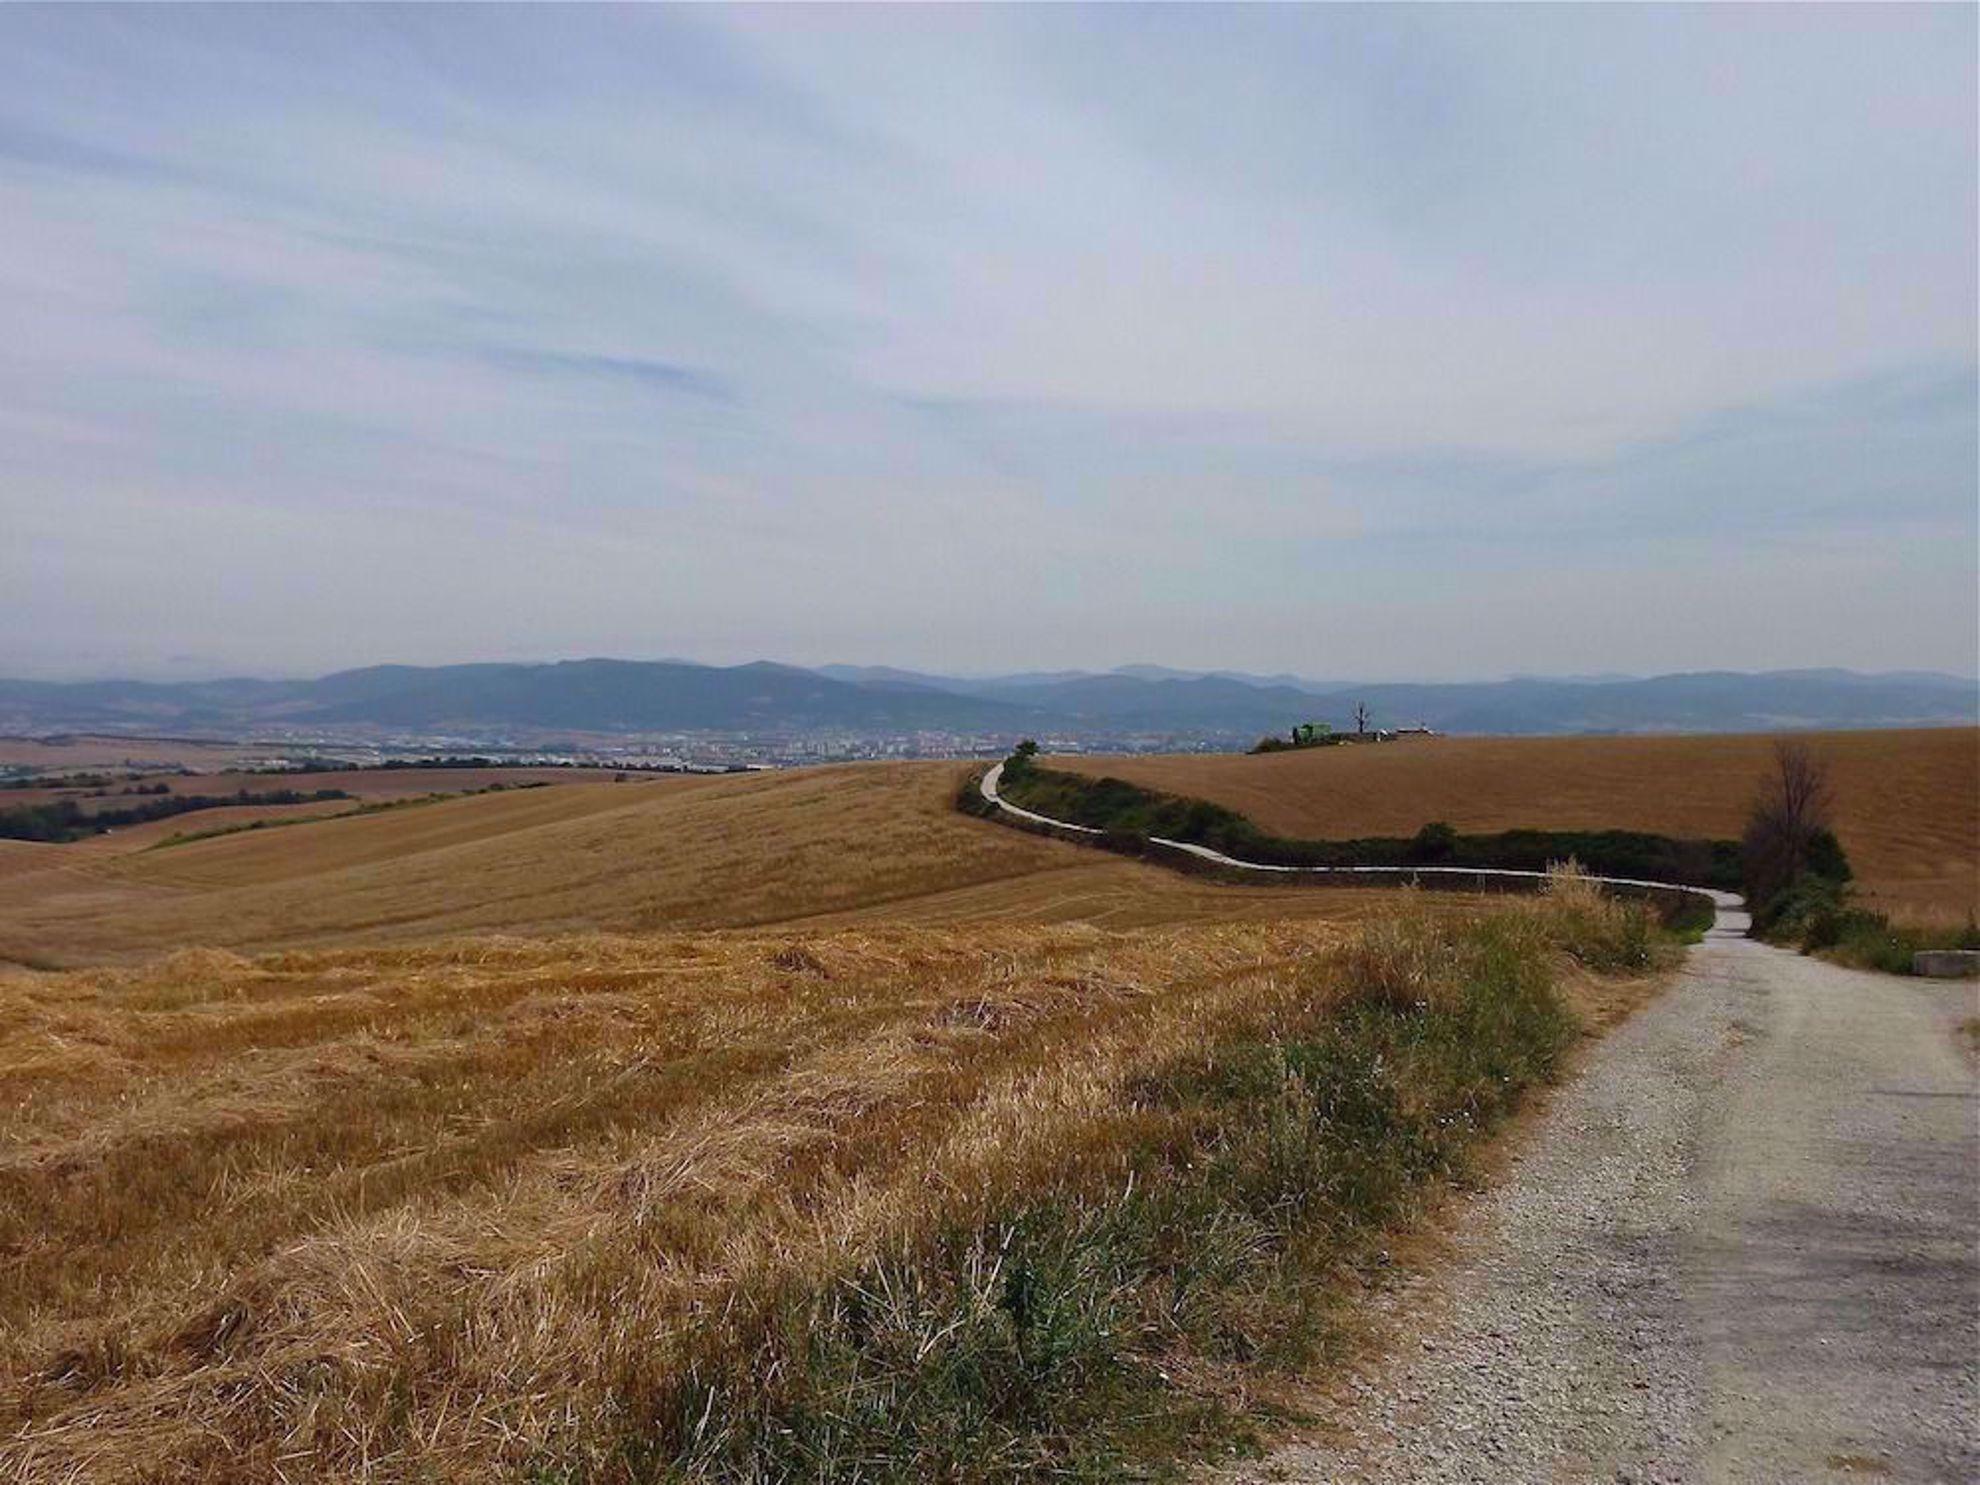 Camino, Spain